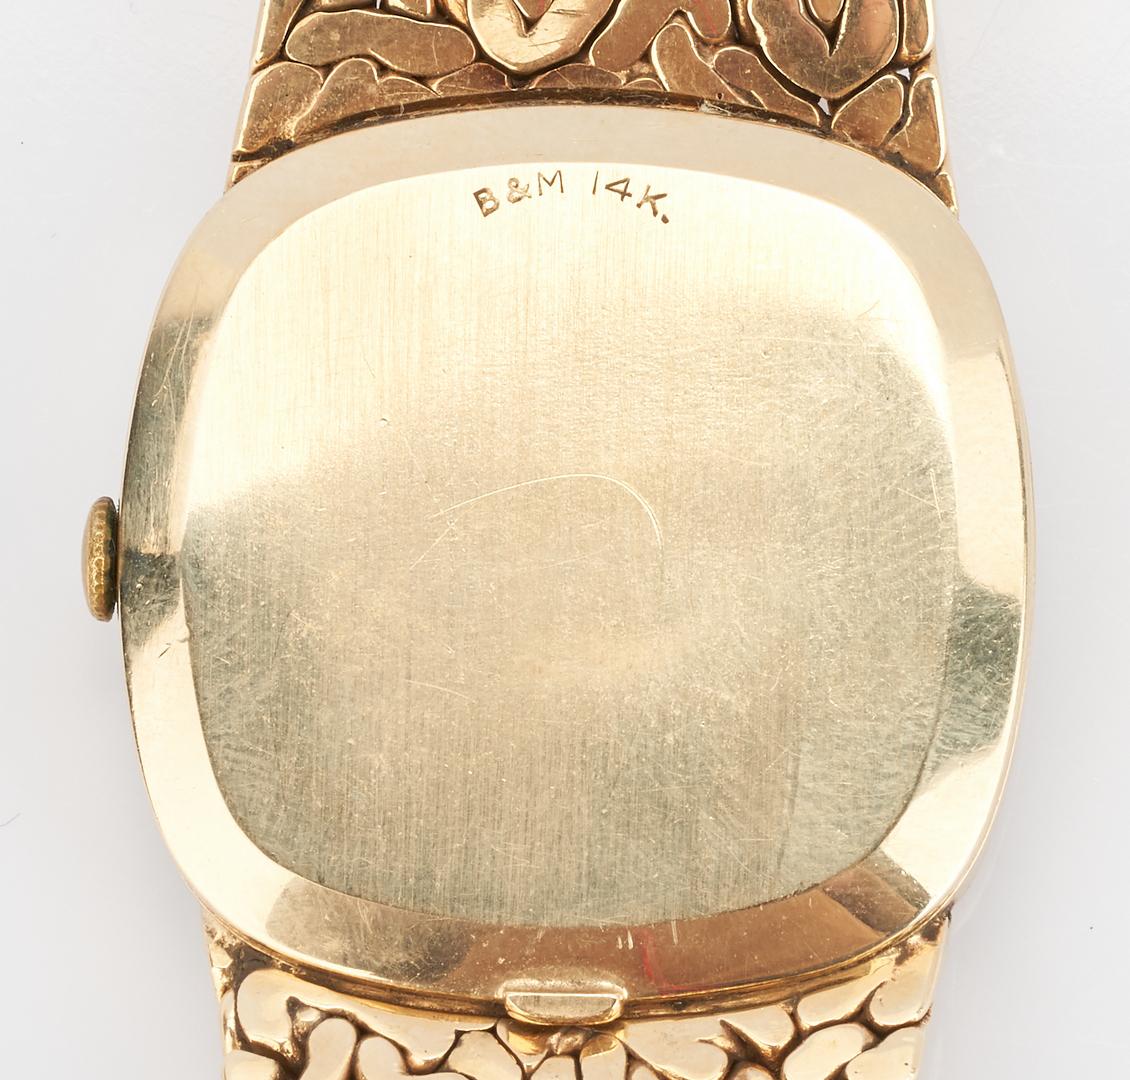 Lot 230: Baume and Mercier Men's Timepiece